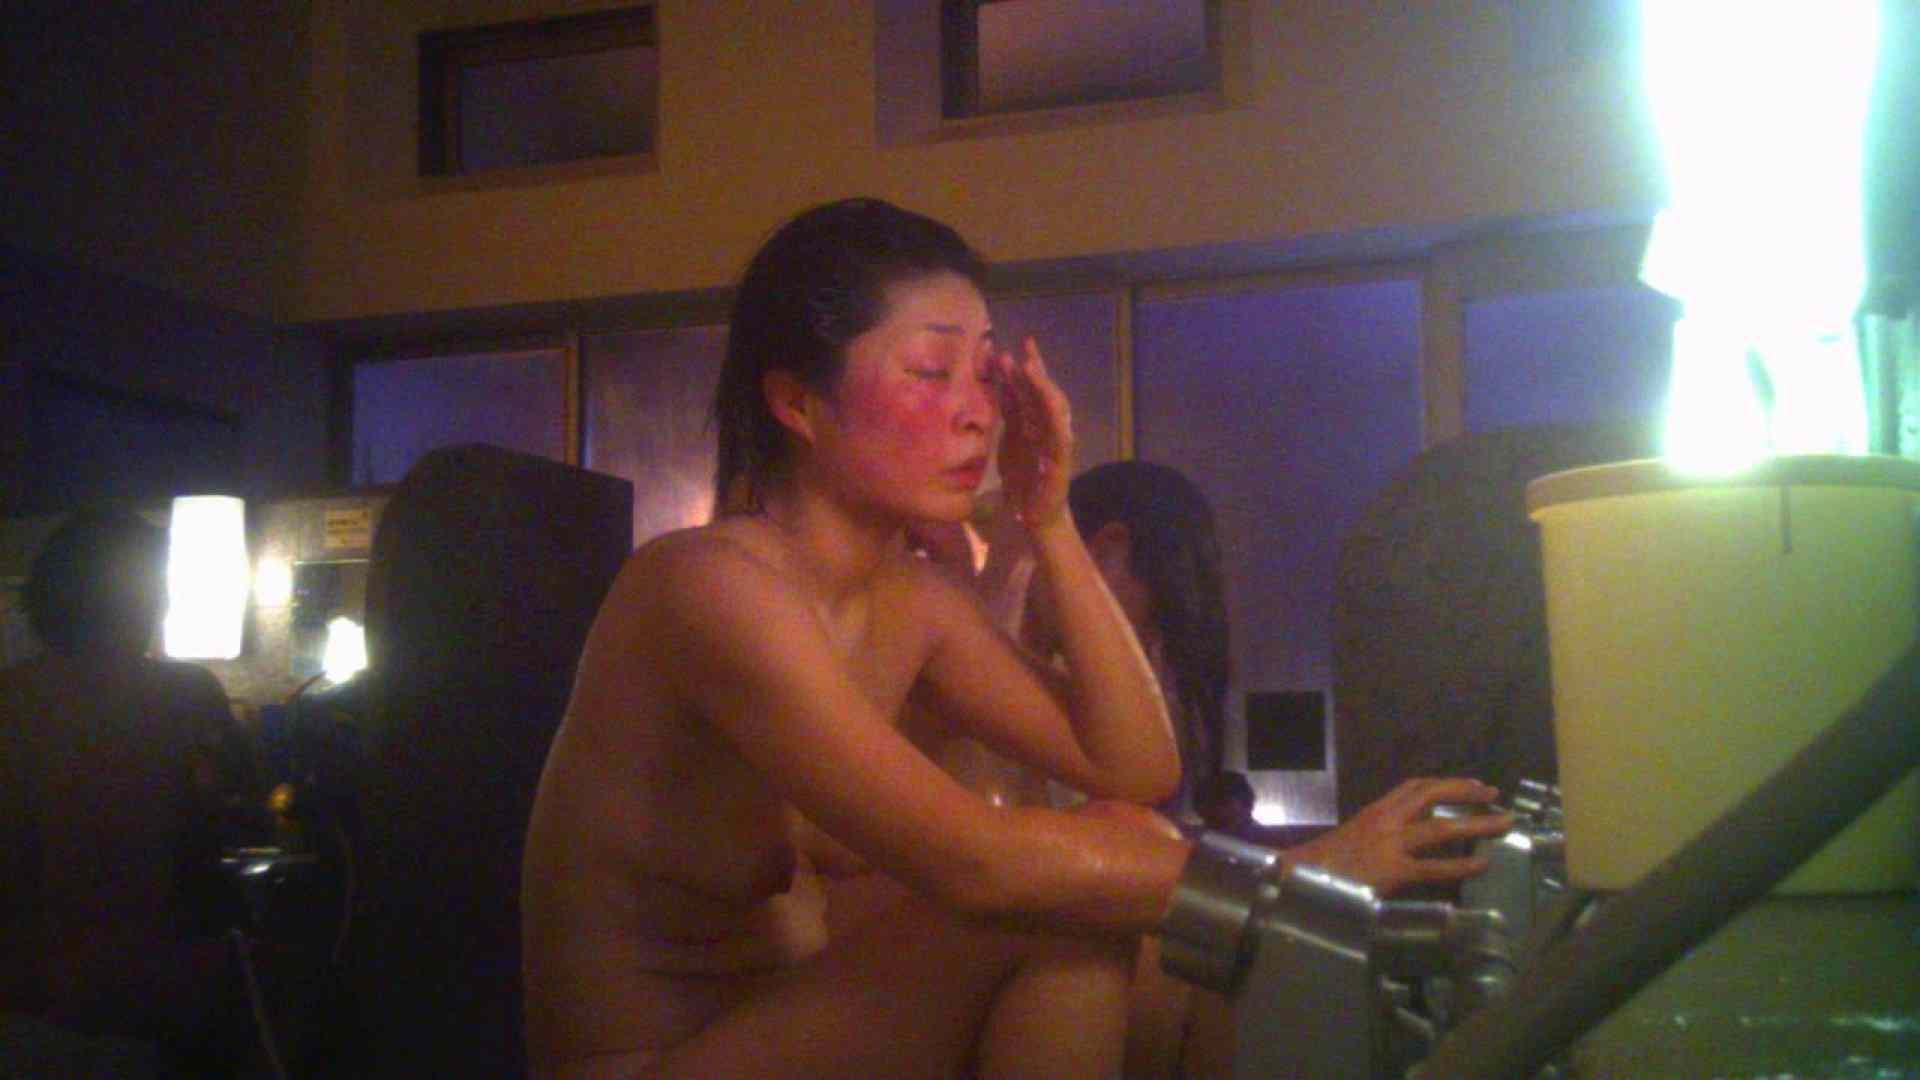 TG.21 【上等兵】井戸端会議が大好きな奥さん アラ40 濡れ場動画紹介 81画像 67